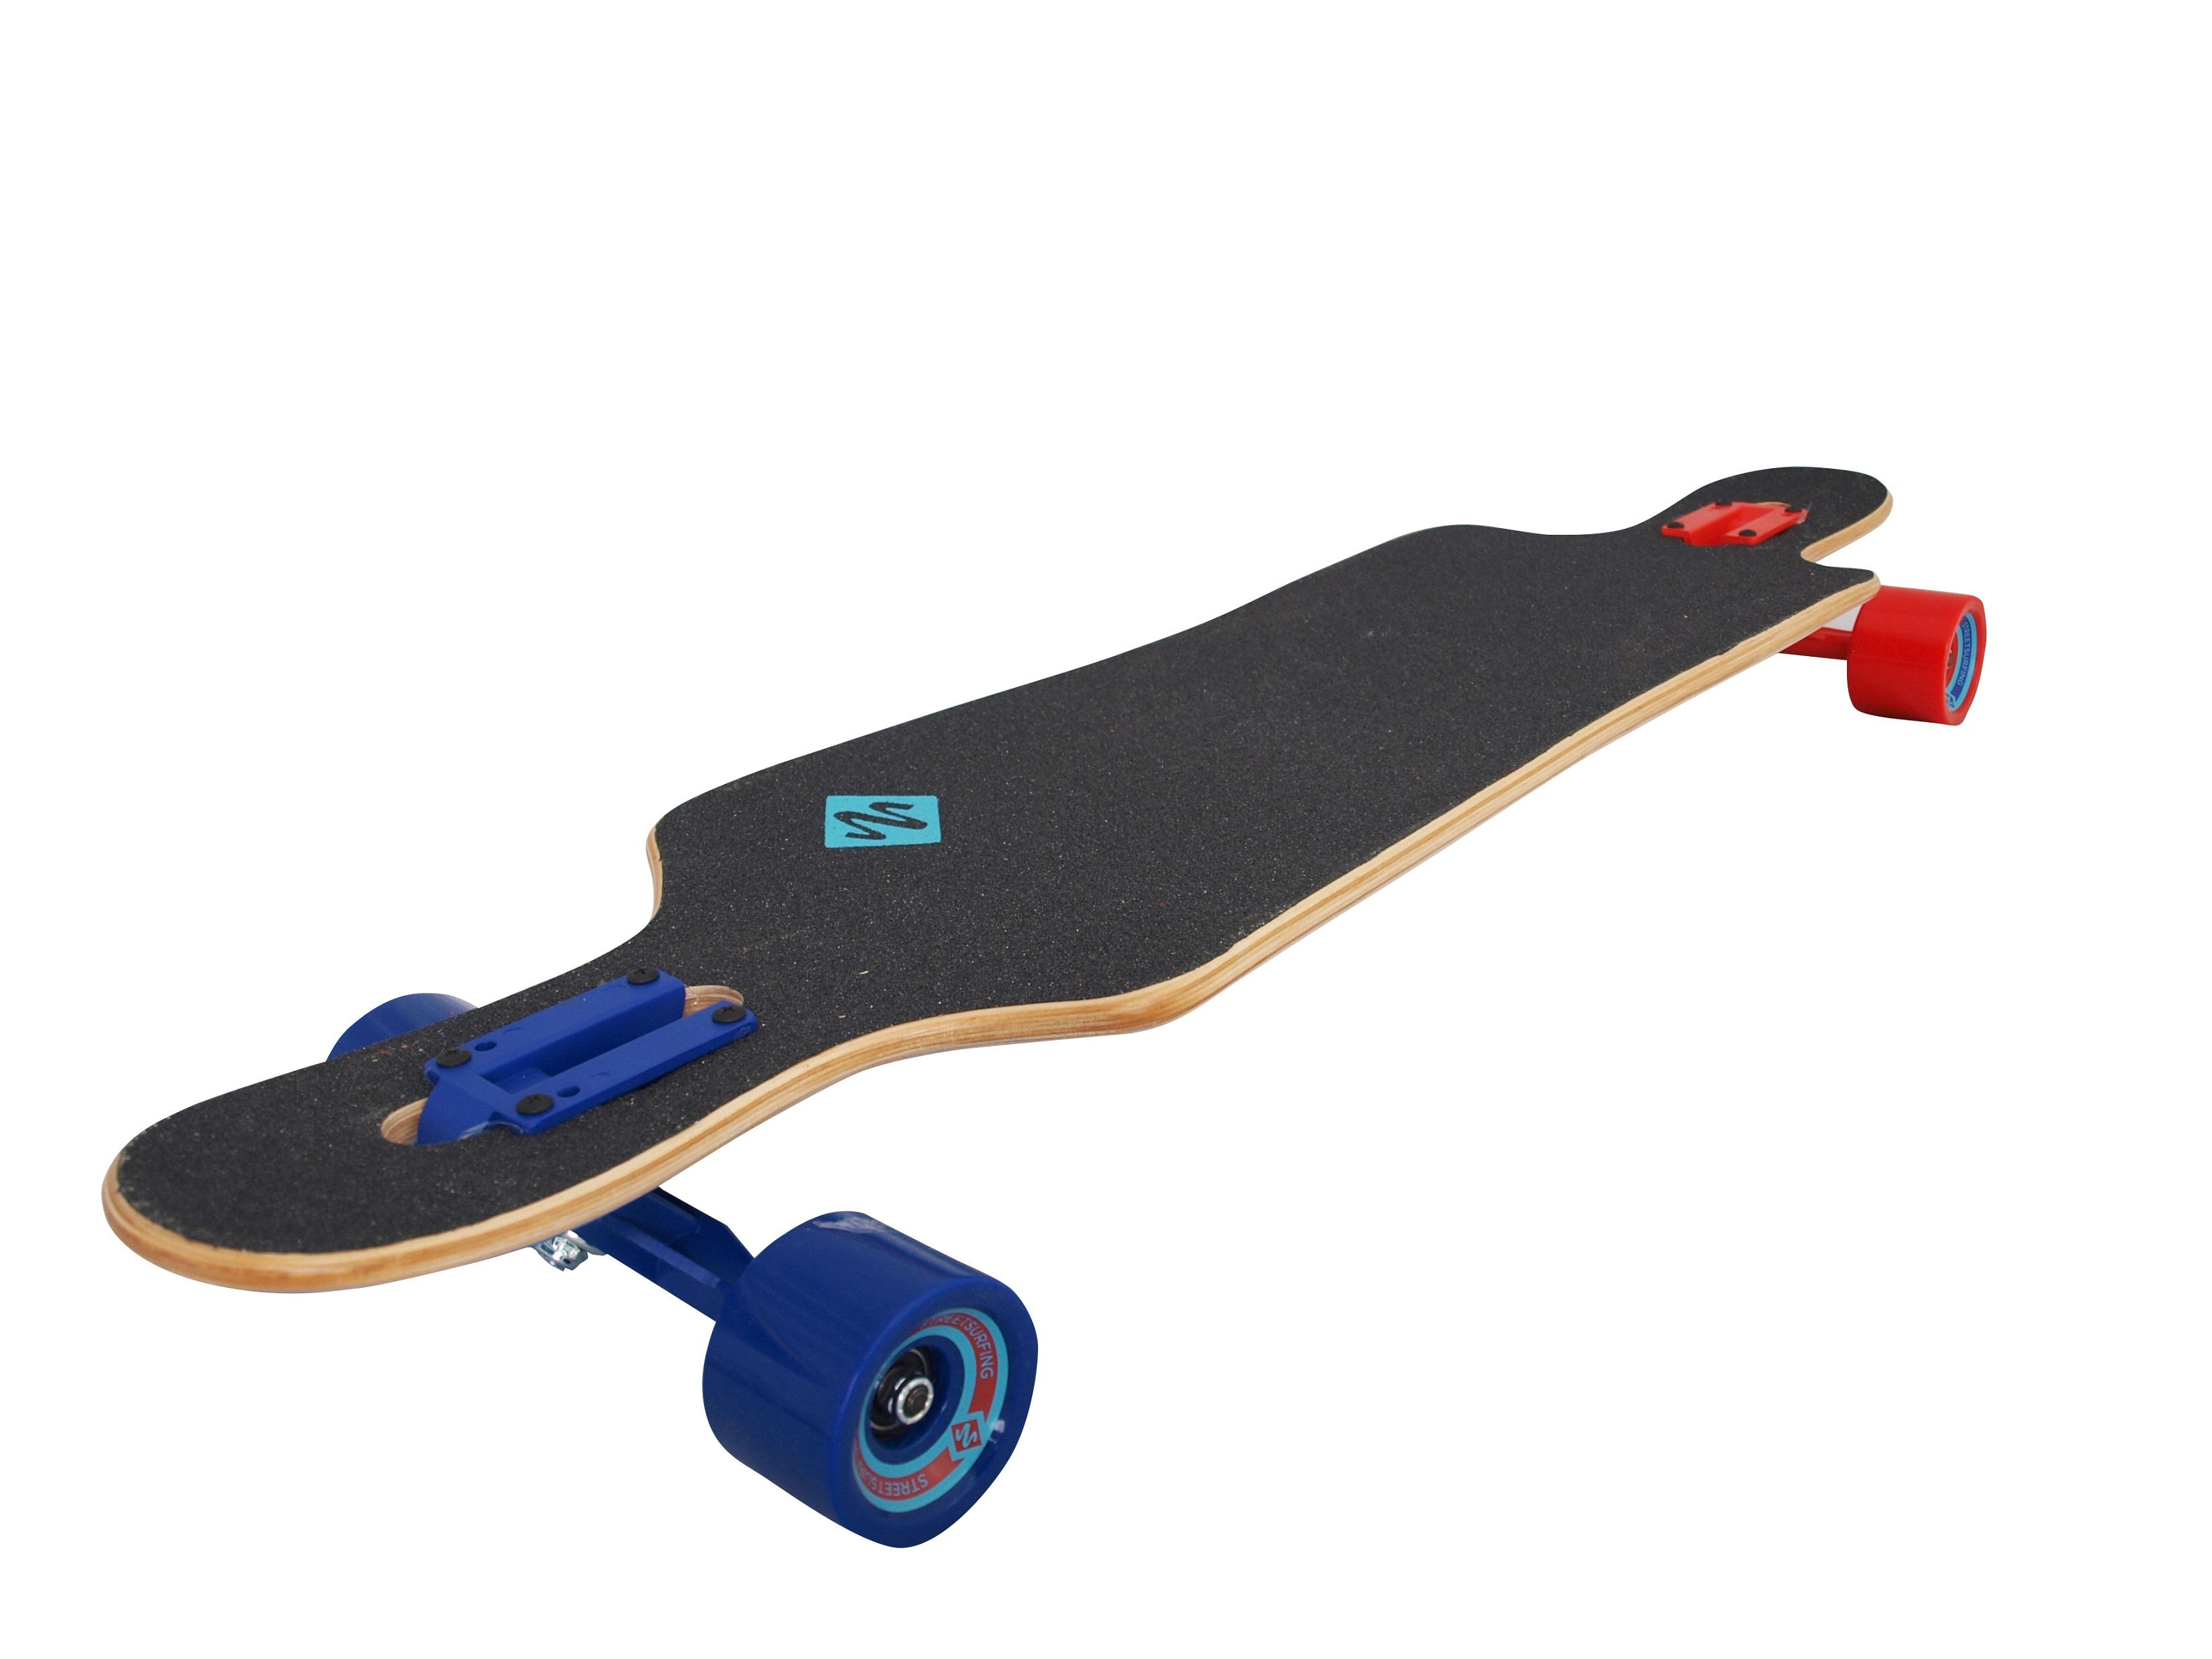 Longboard Freeride39 DropTrough Curve Higher Faster